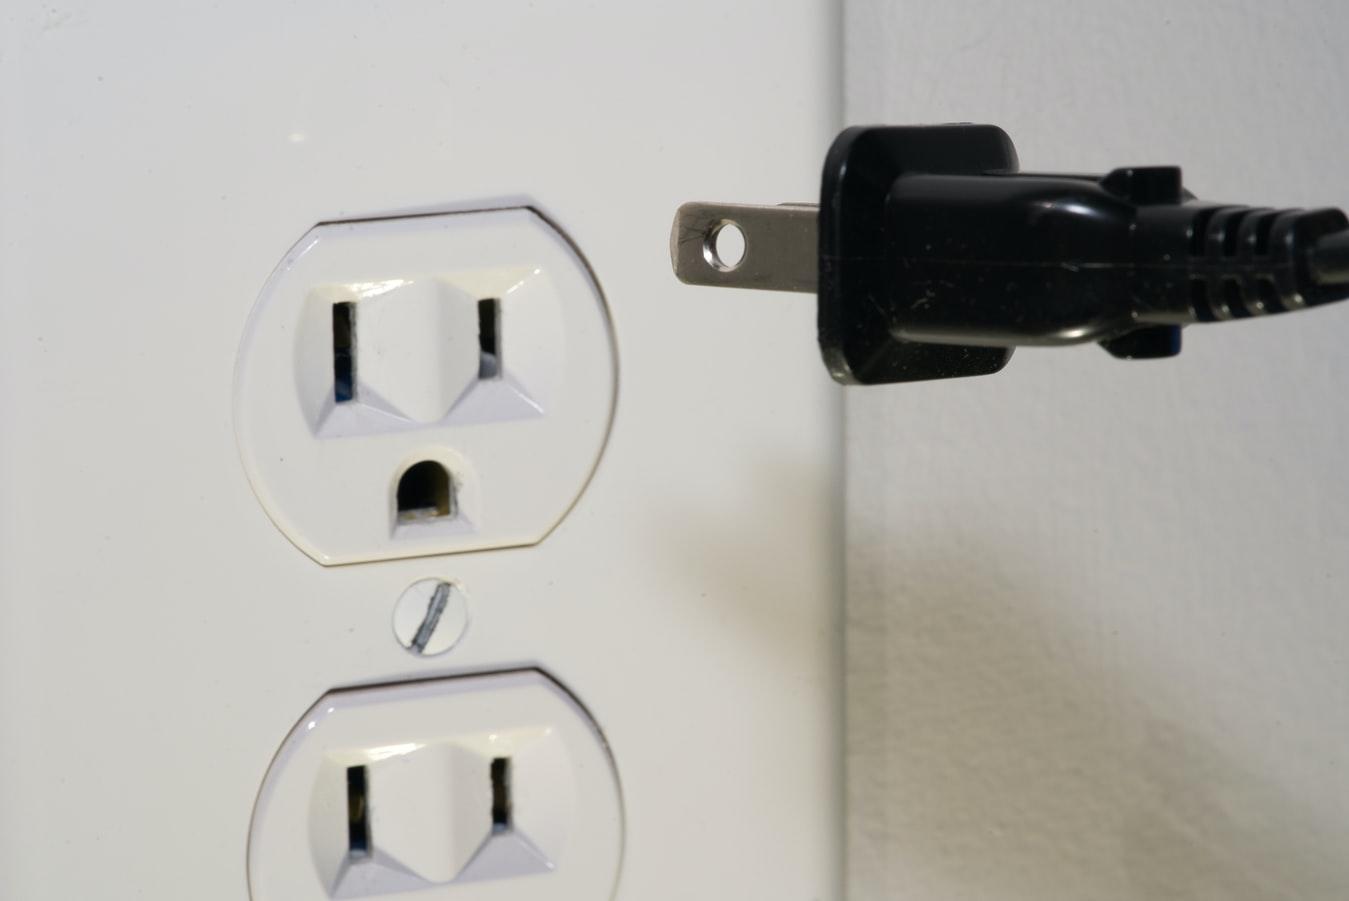 can you plug a mini fridge into a regular outlet